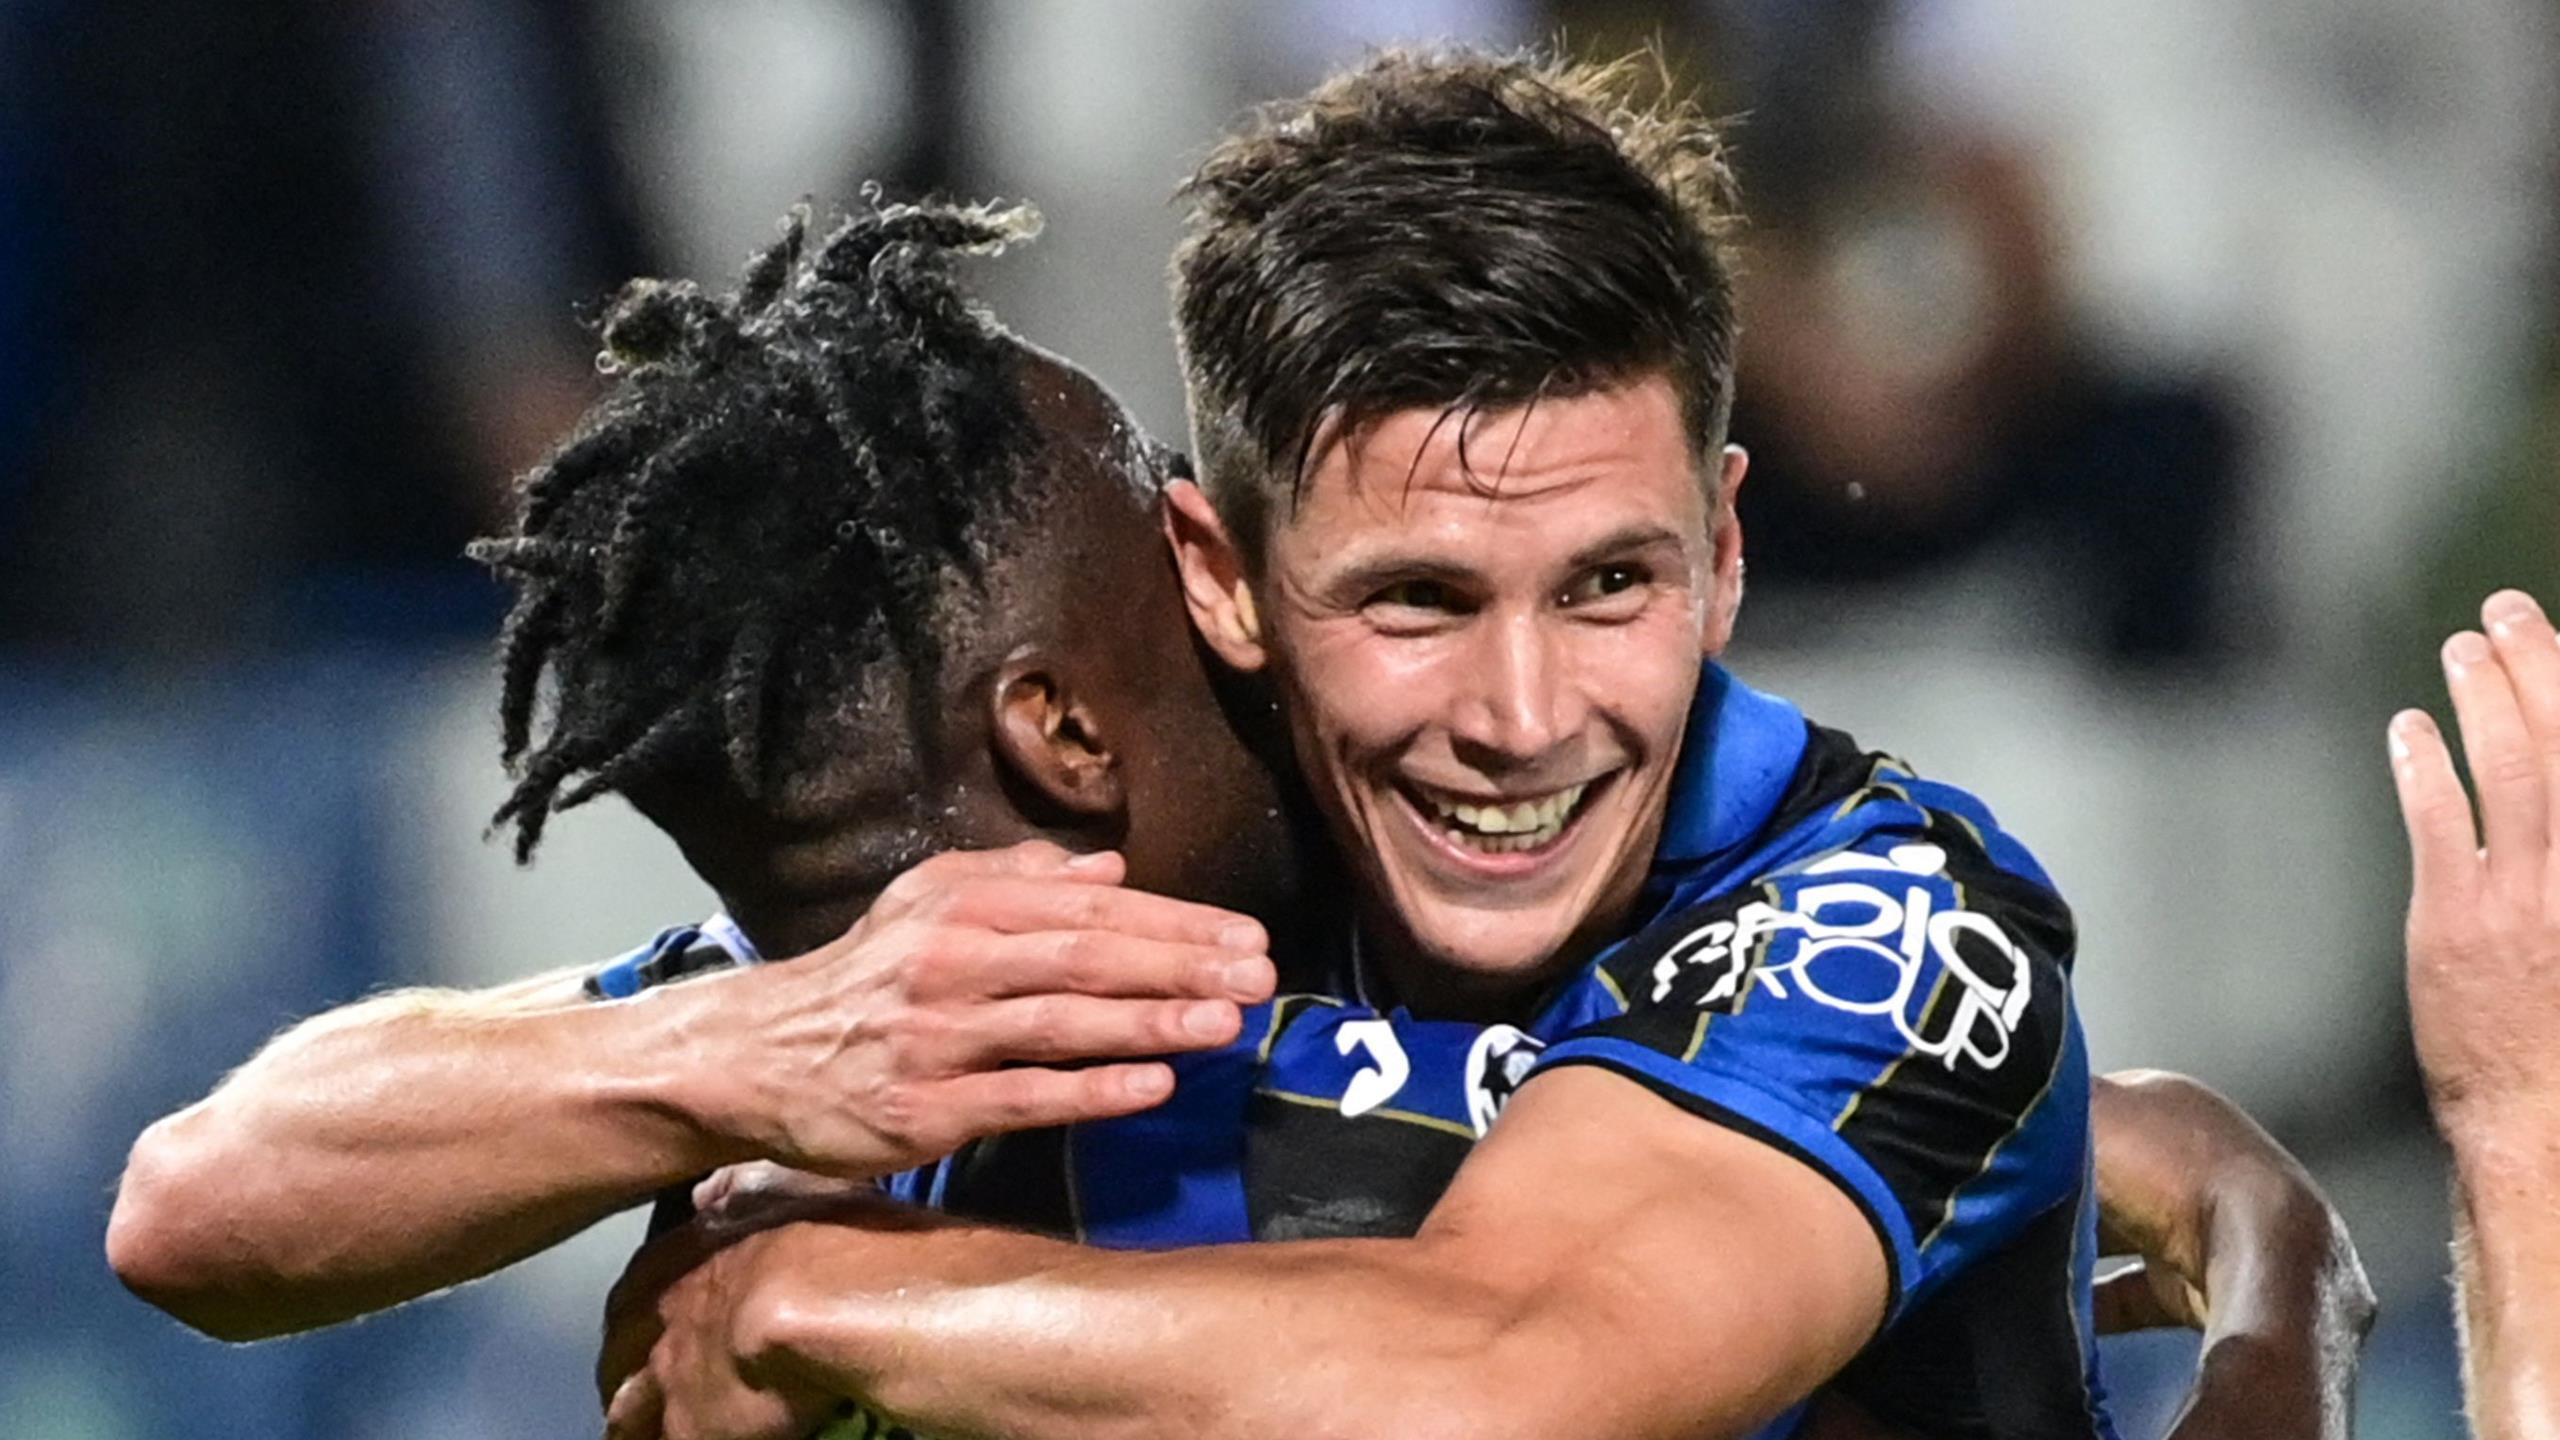 Champions League: Matteo Pessina sees Atalanta past Young Boys, Zenit St  Petersburg beat Malmo - Eurosport